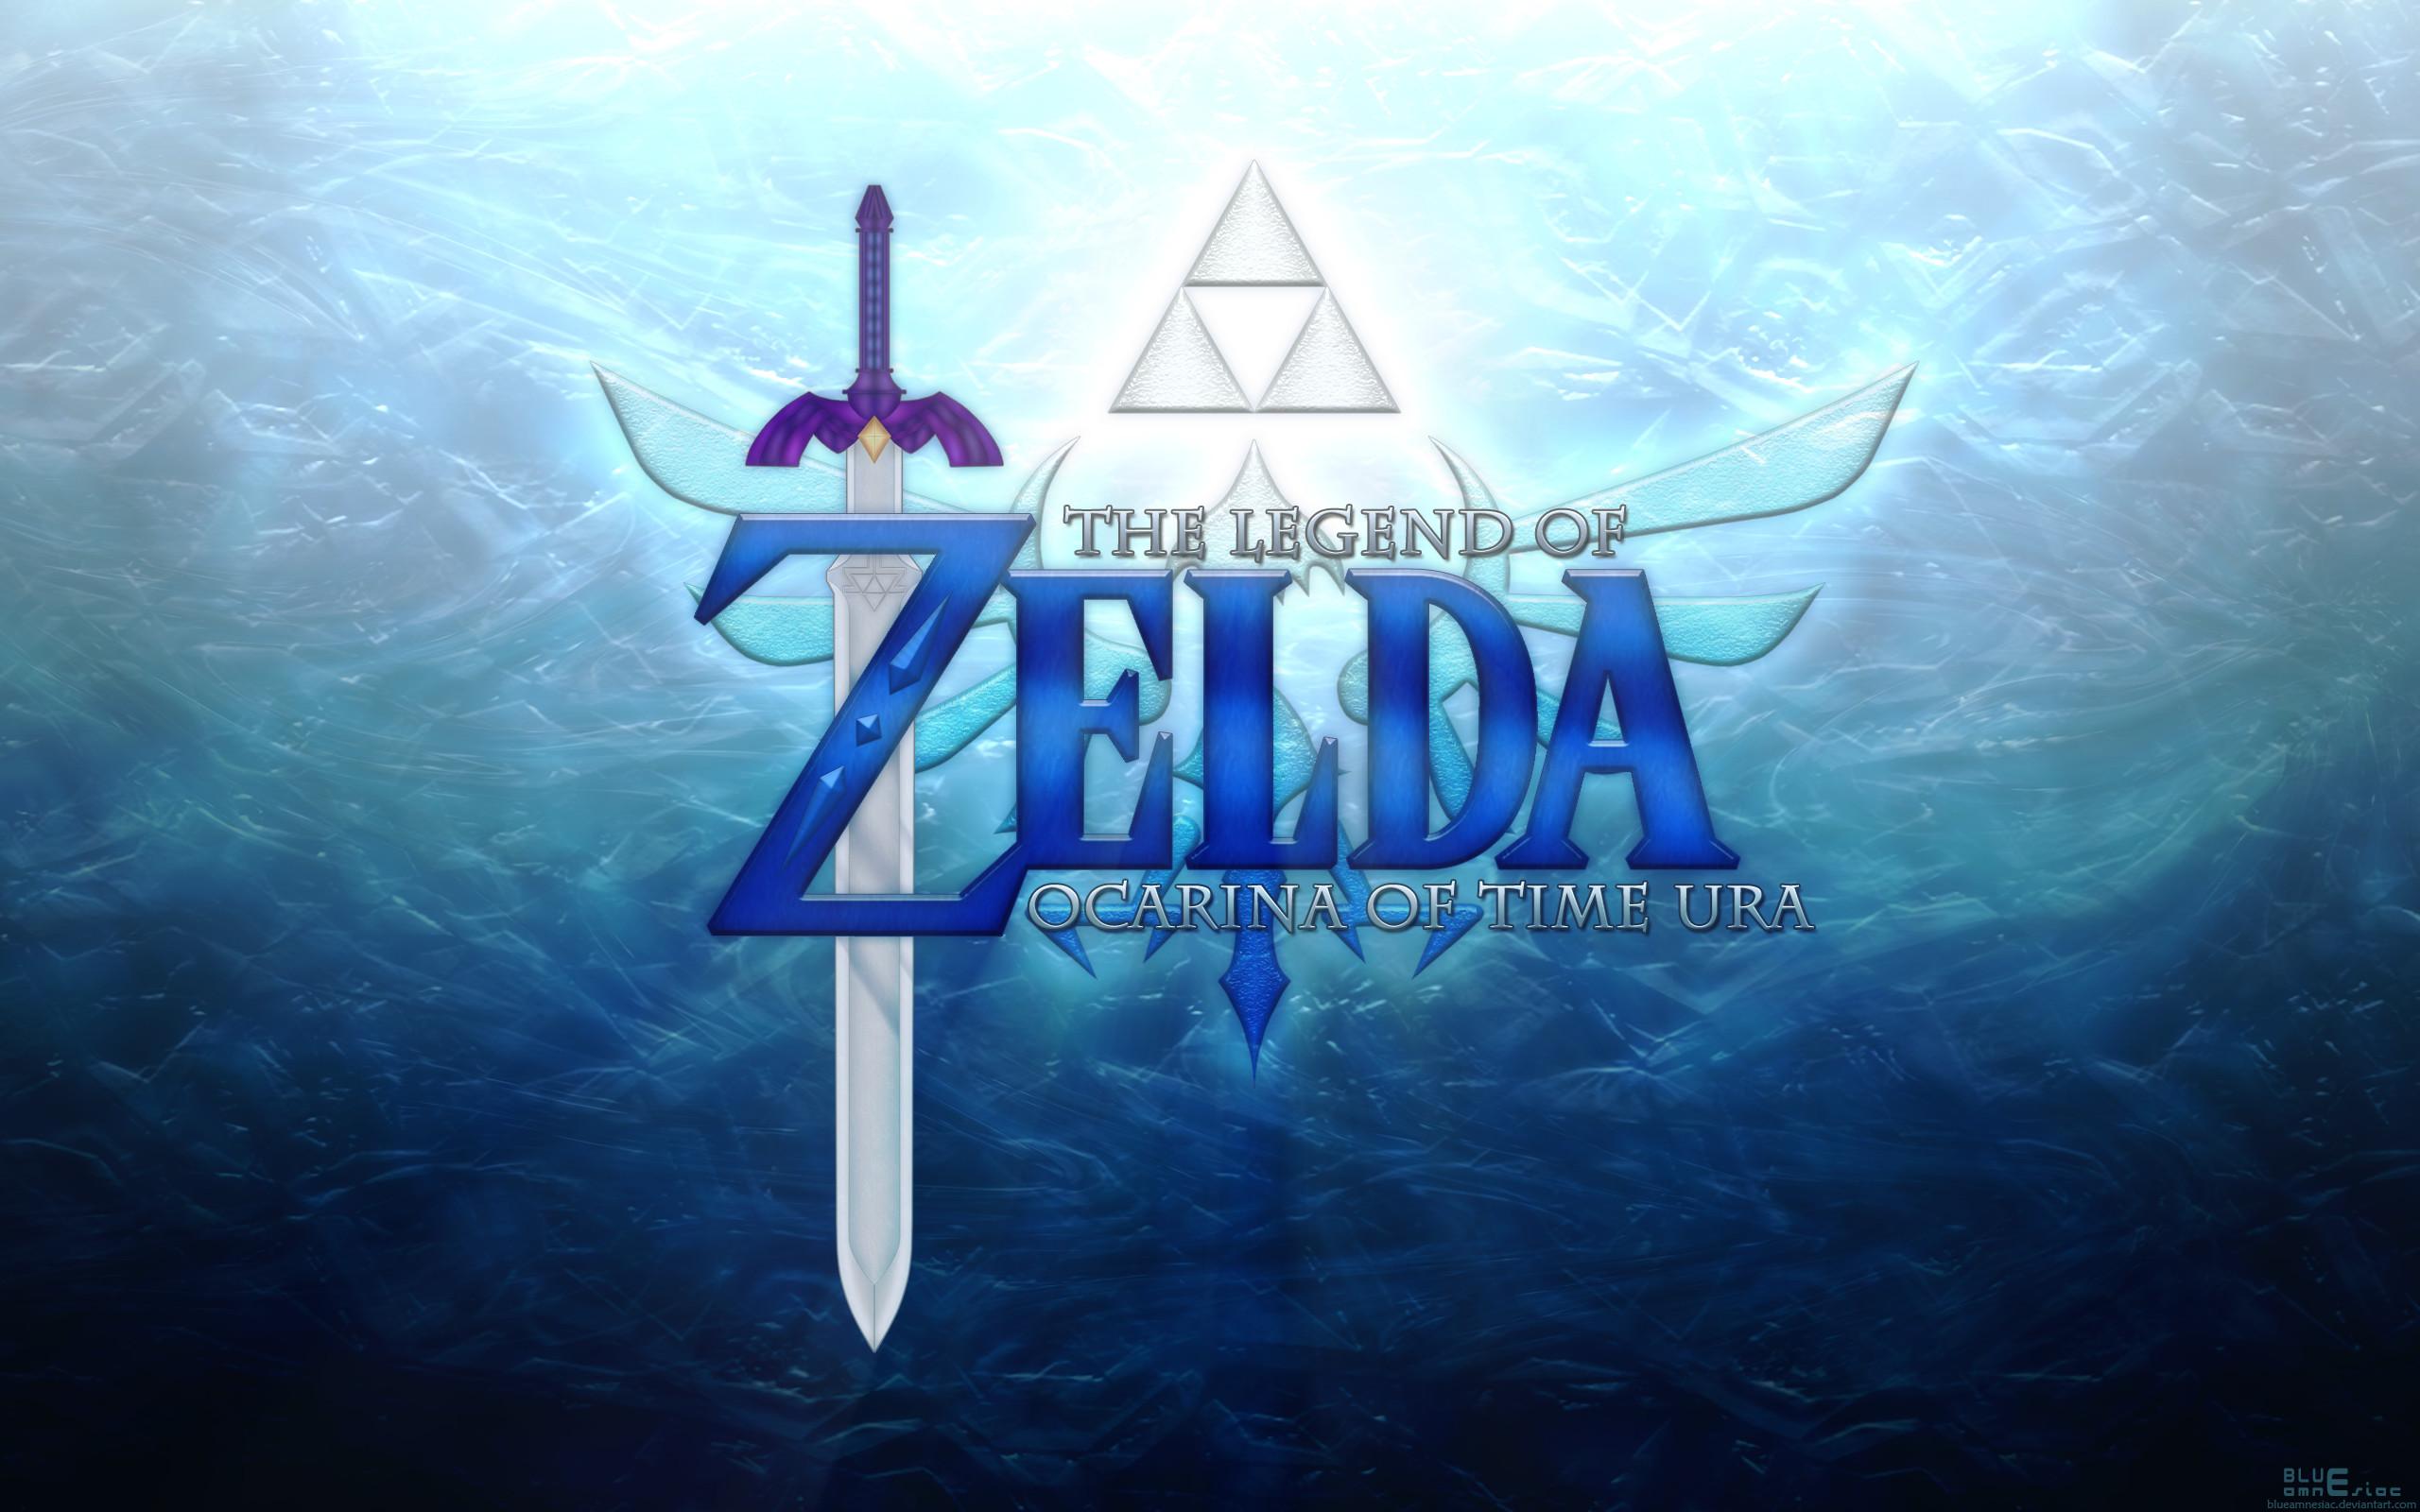 The Legend Of Zelda HD desktop wallpaper High Definition   HD Wallpapers    Pinterest   Mobile wallpaper, Hd wallpaper and Wallpaper